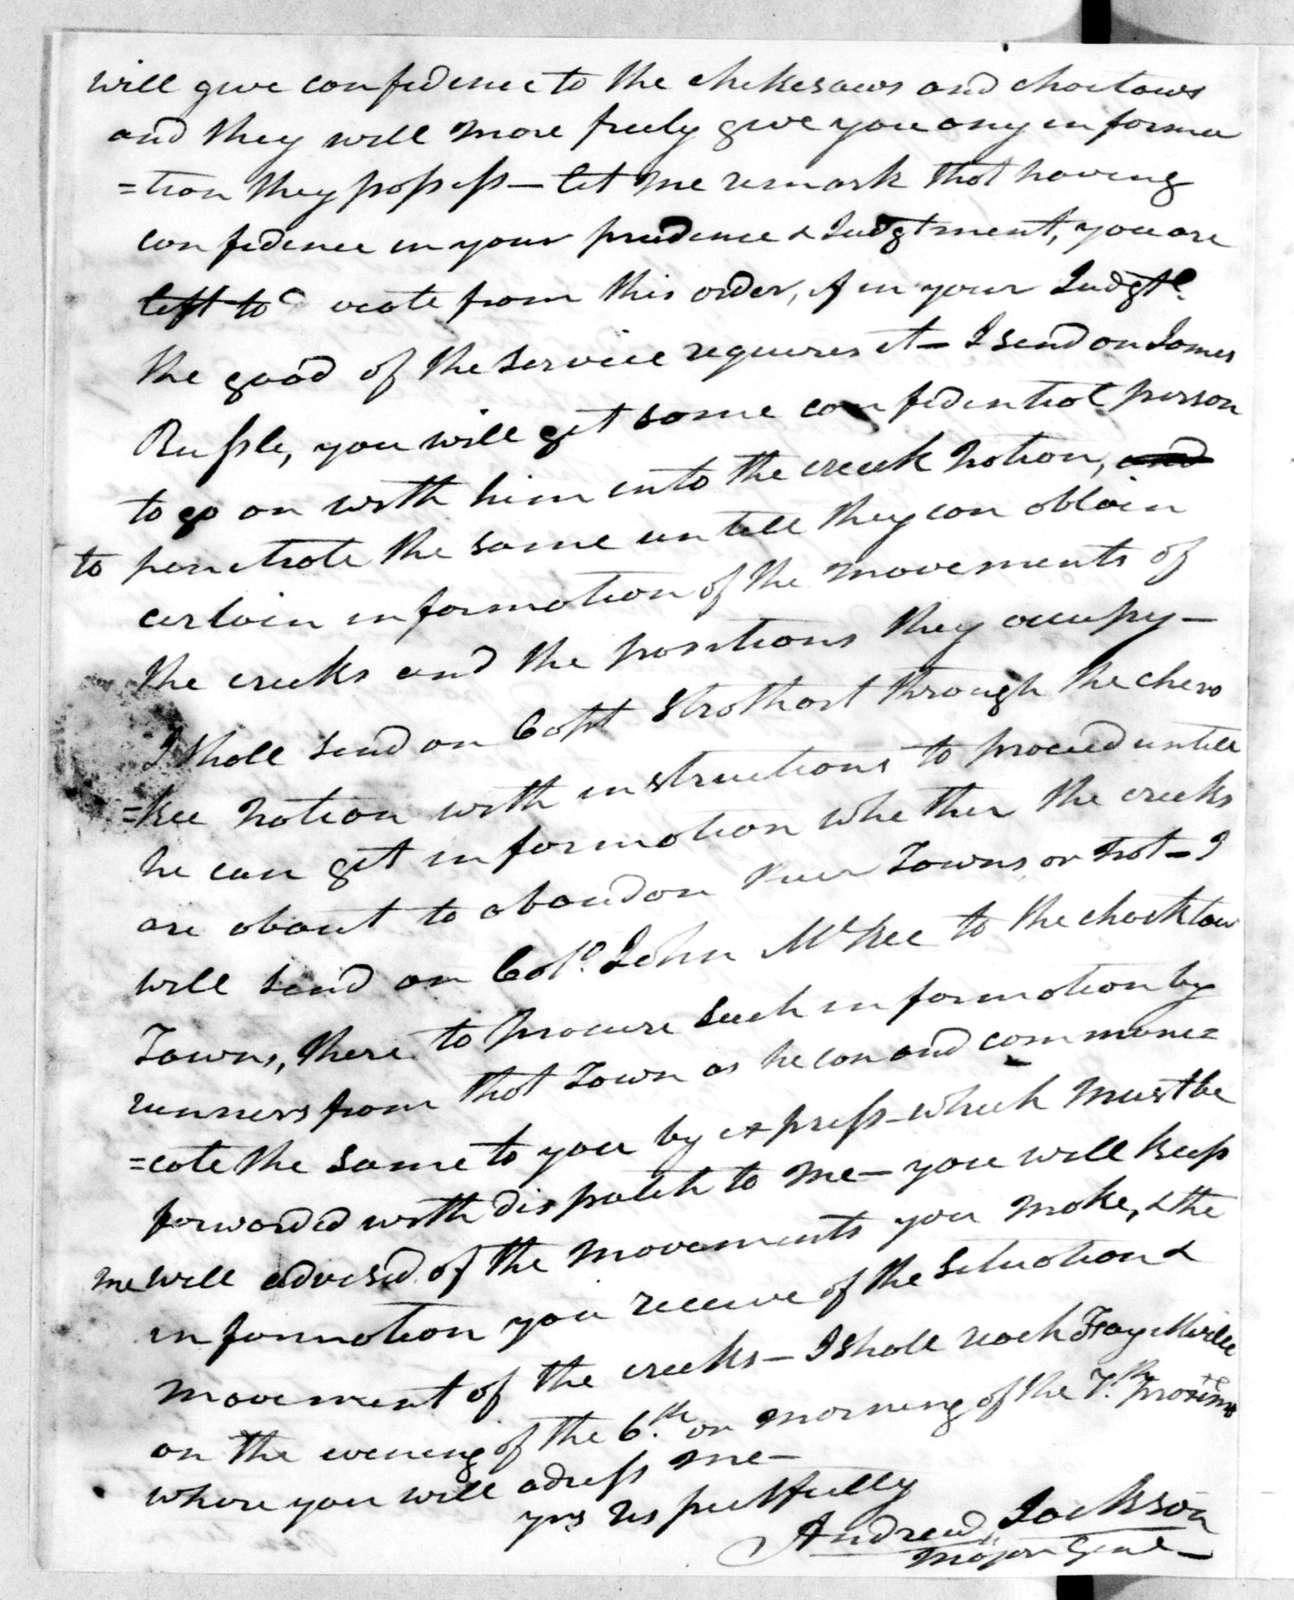 Andrew Jackson to John Coffee, September 27, 1813